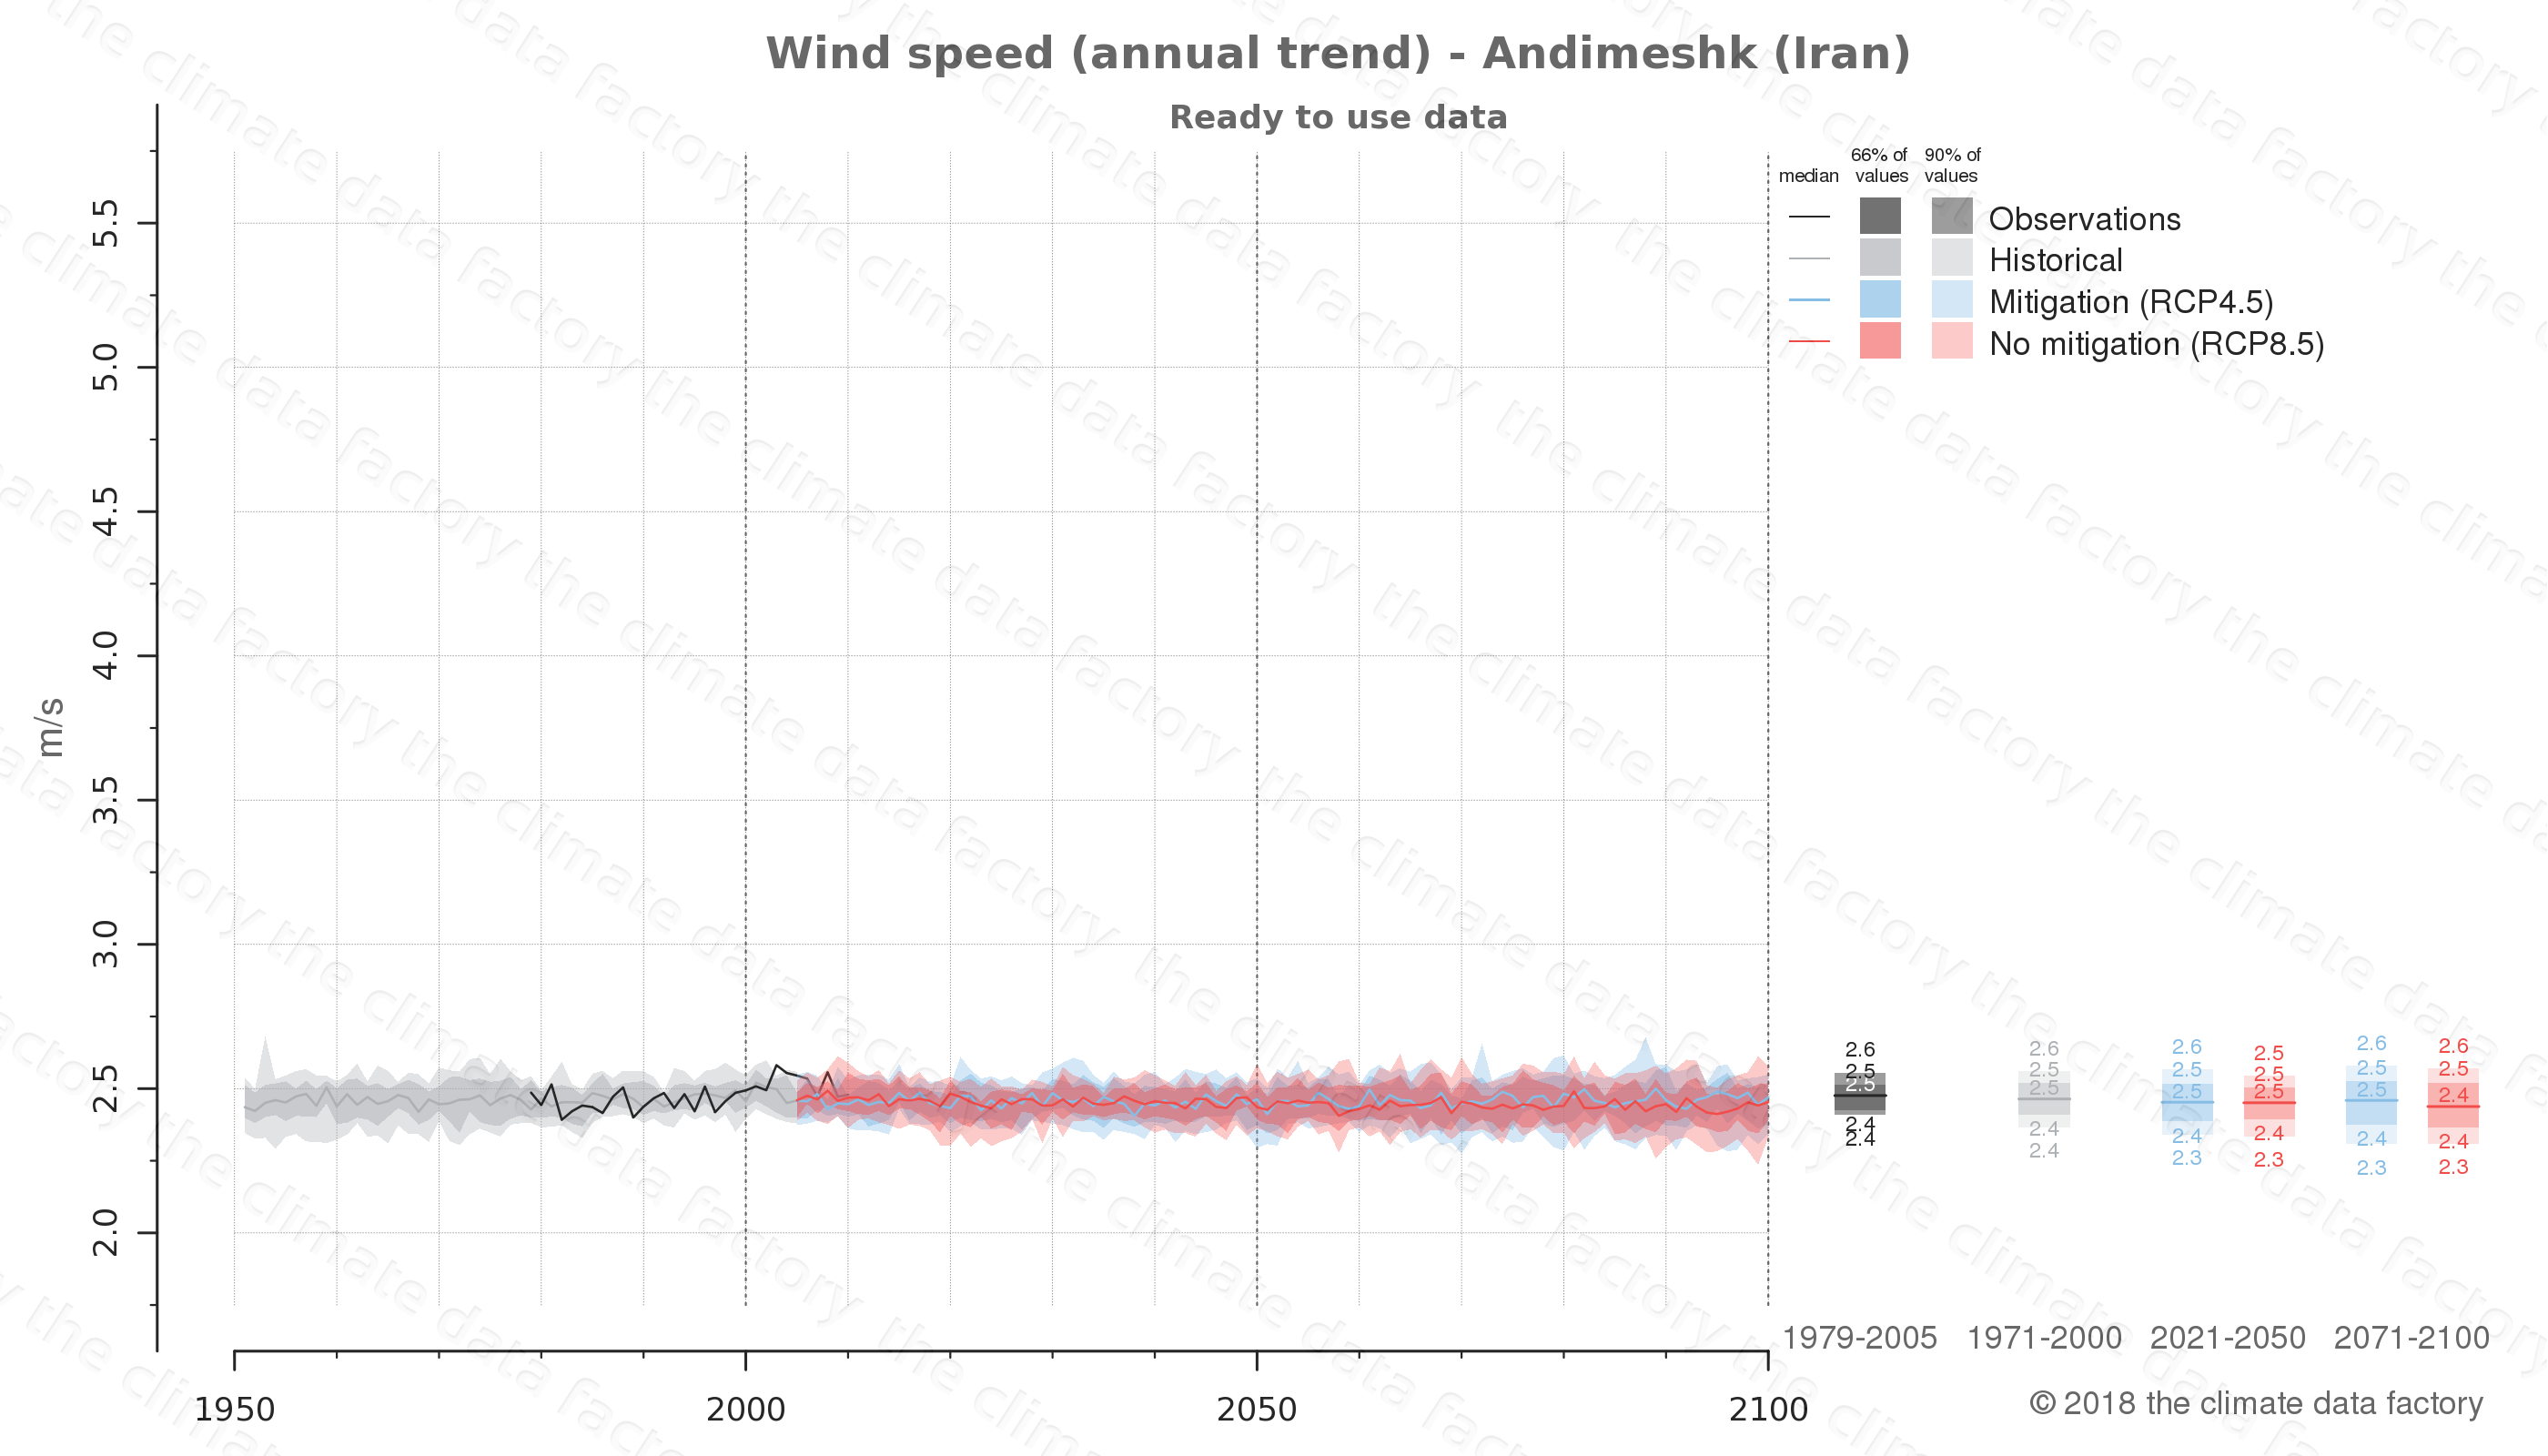 climate change data policy adaptation climate graph city data wind-speed andimeshk iran